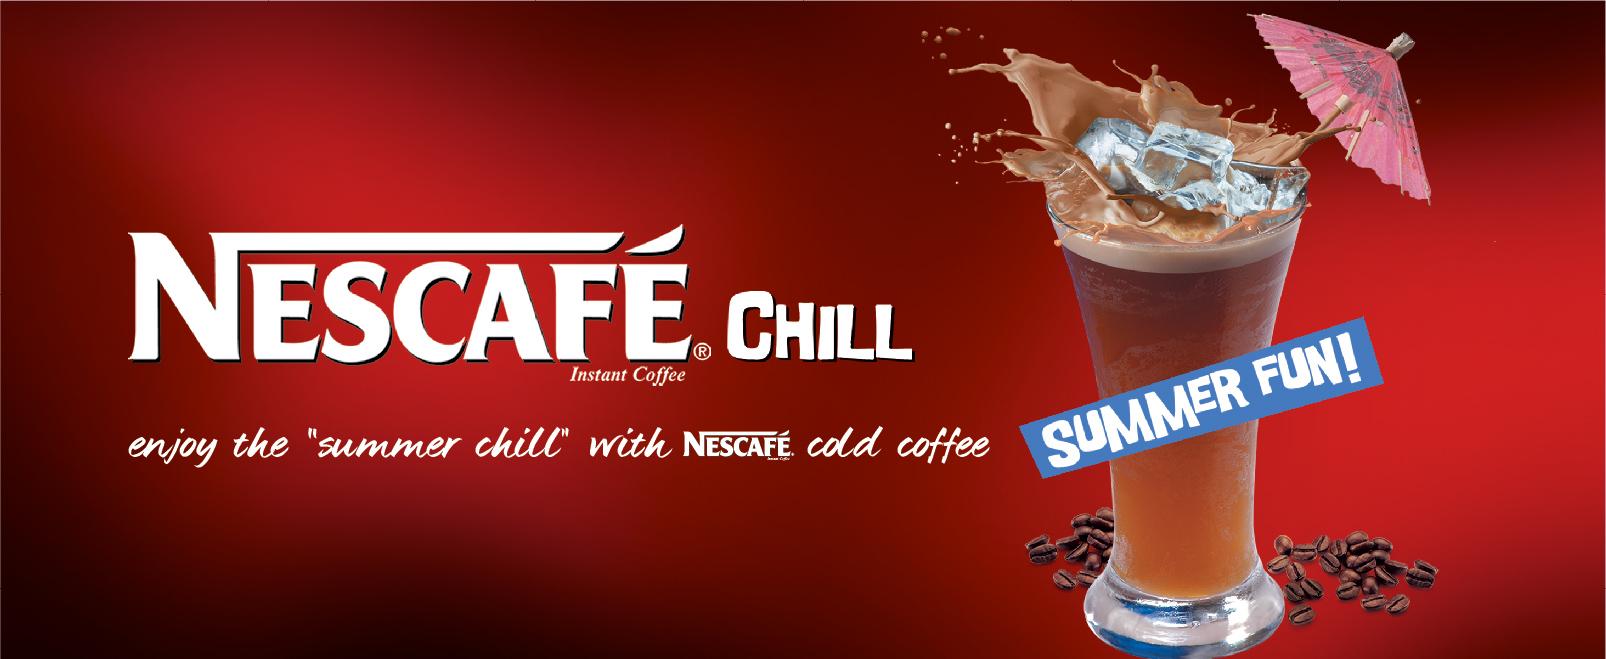 NESCAFE-cold coffee 4 by capmunir on DeviantArt